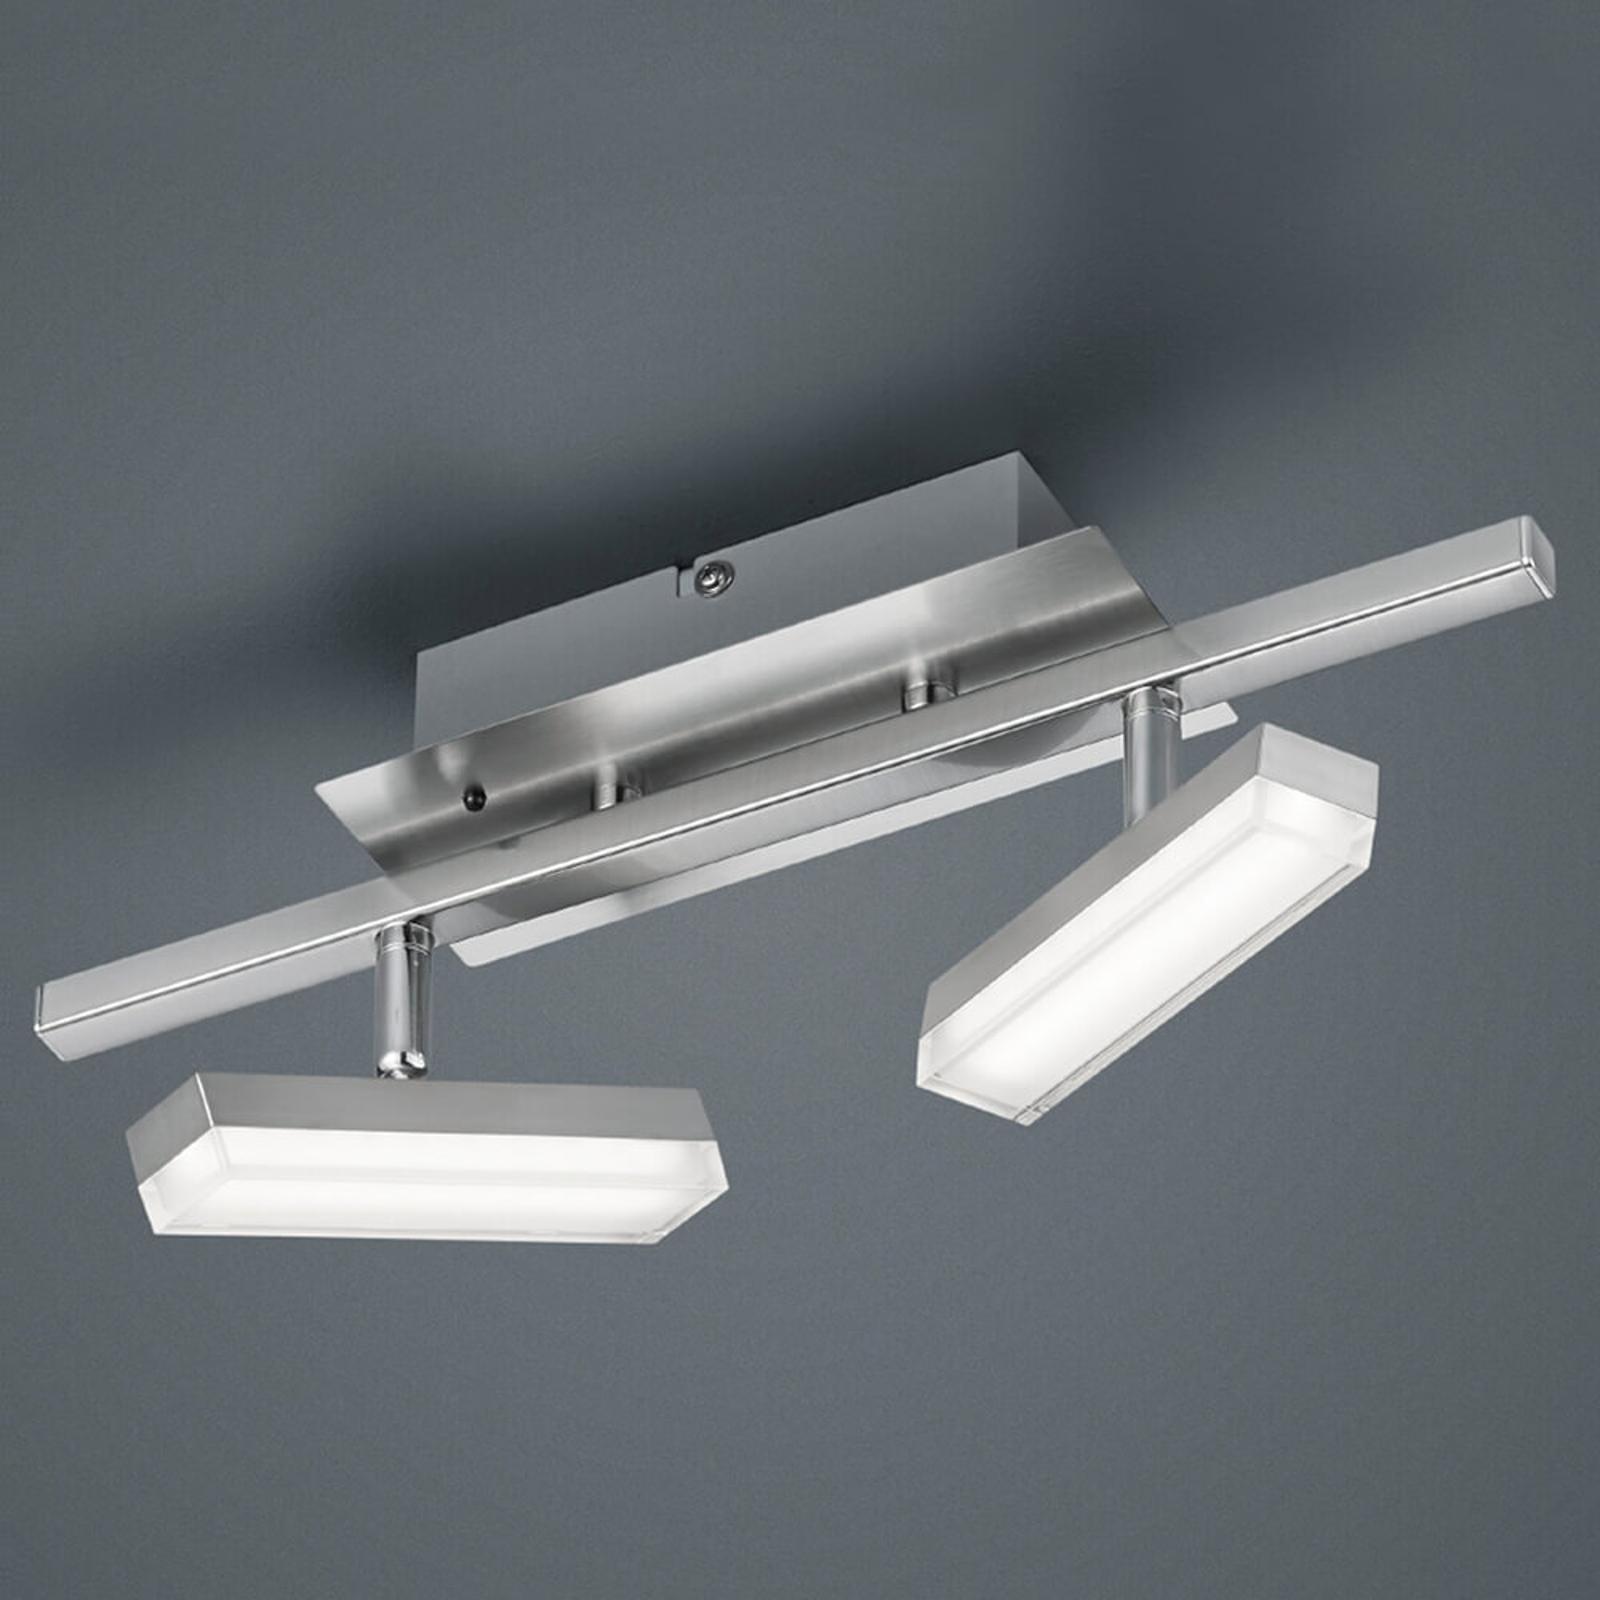 RGB-LED plafondlamp Bondy 2-lamps